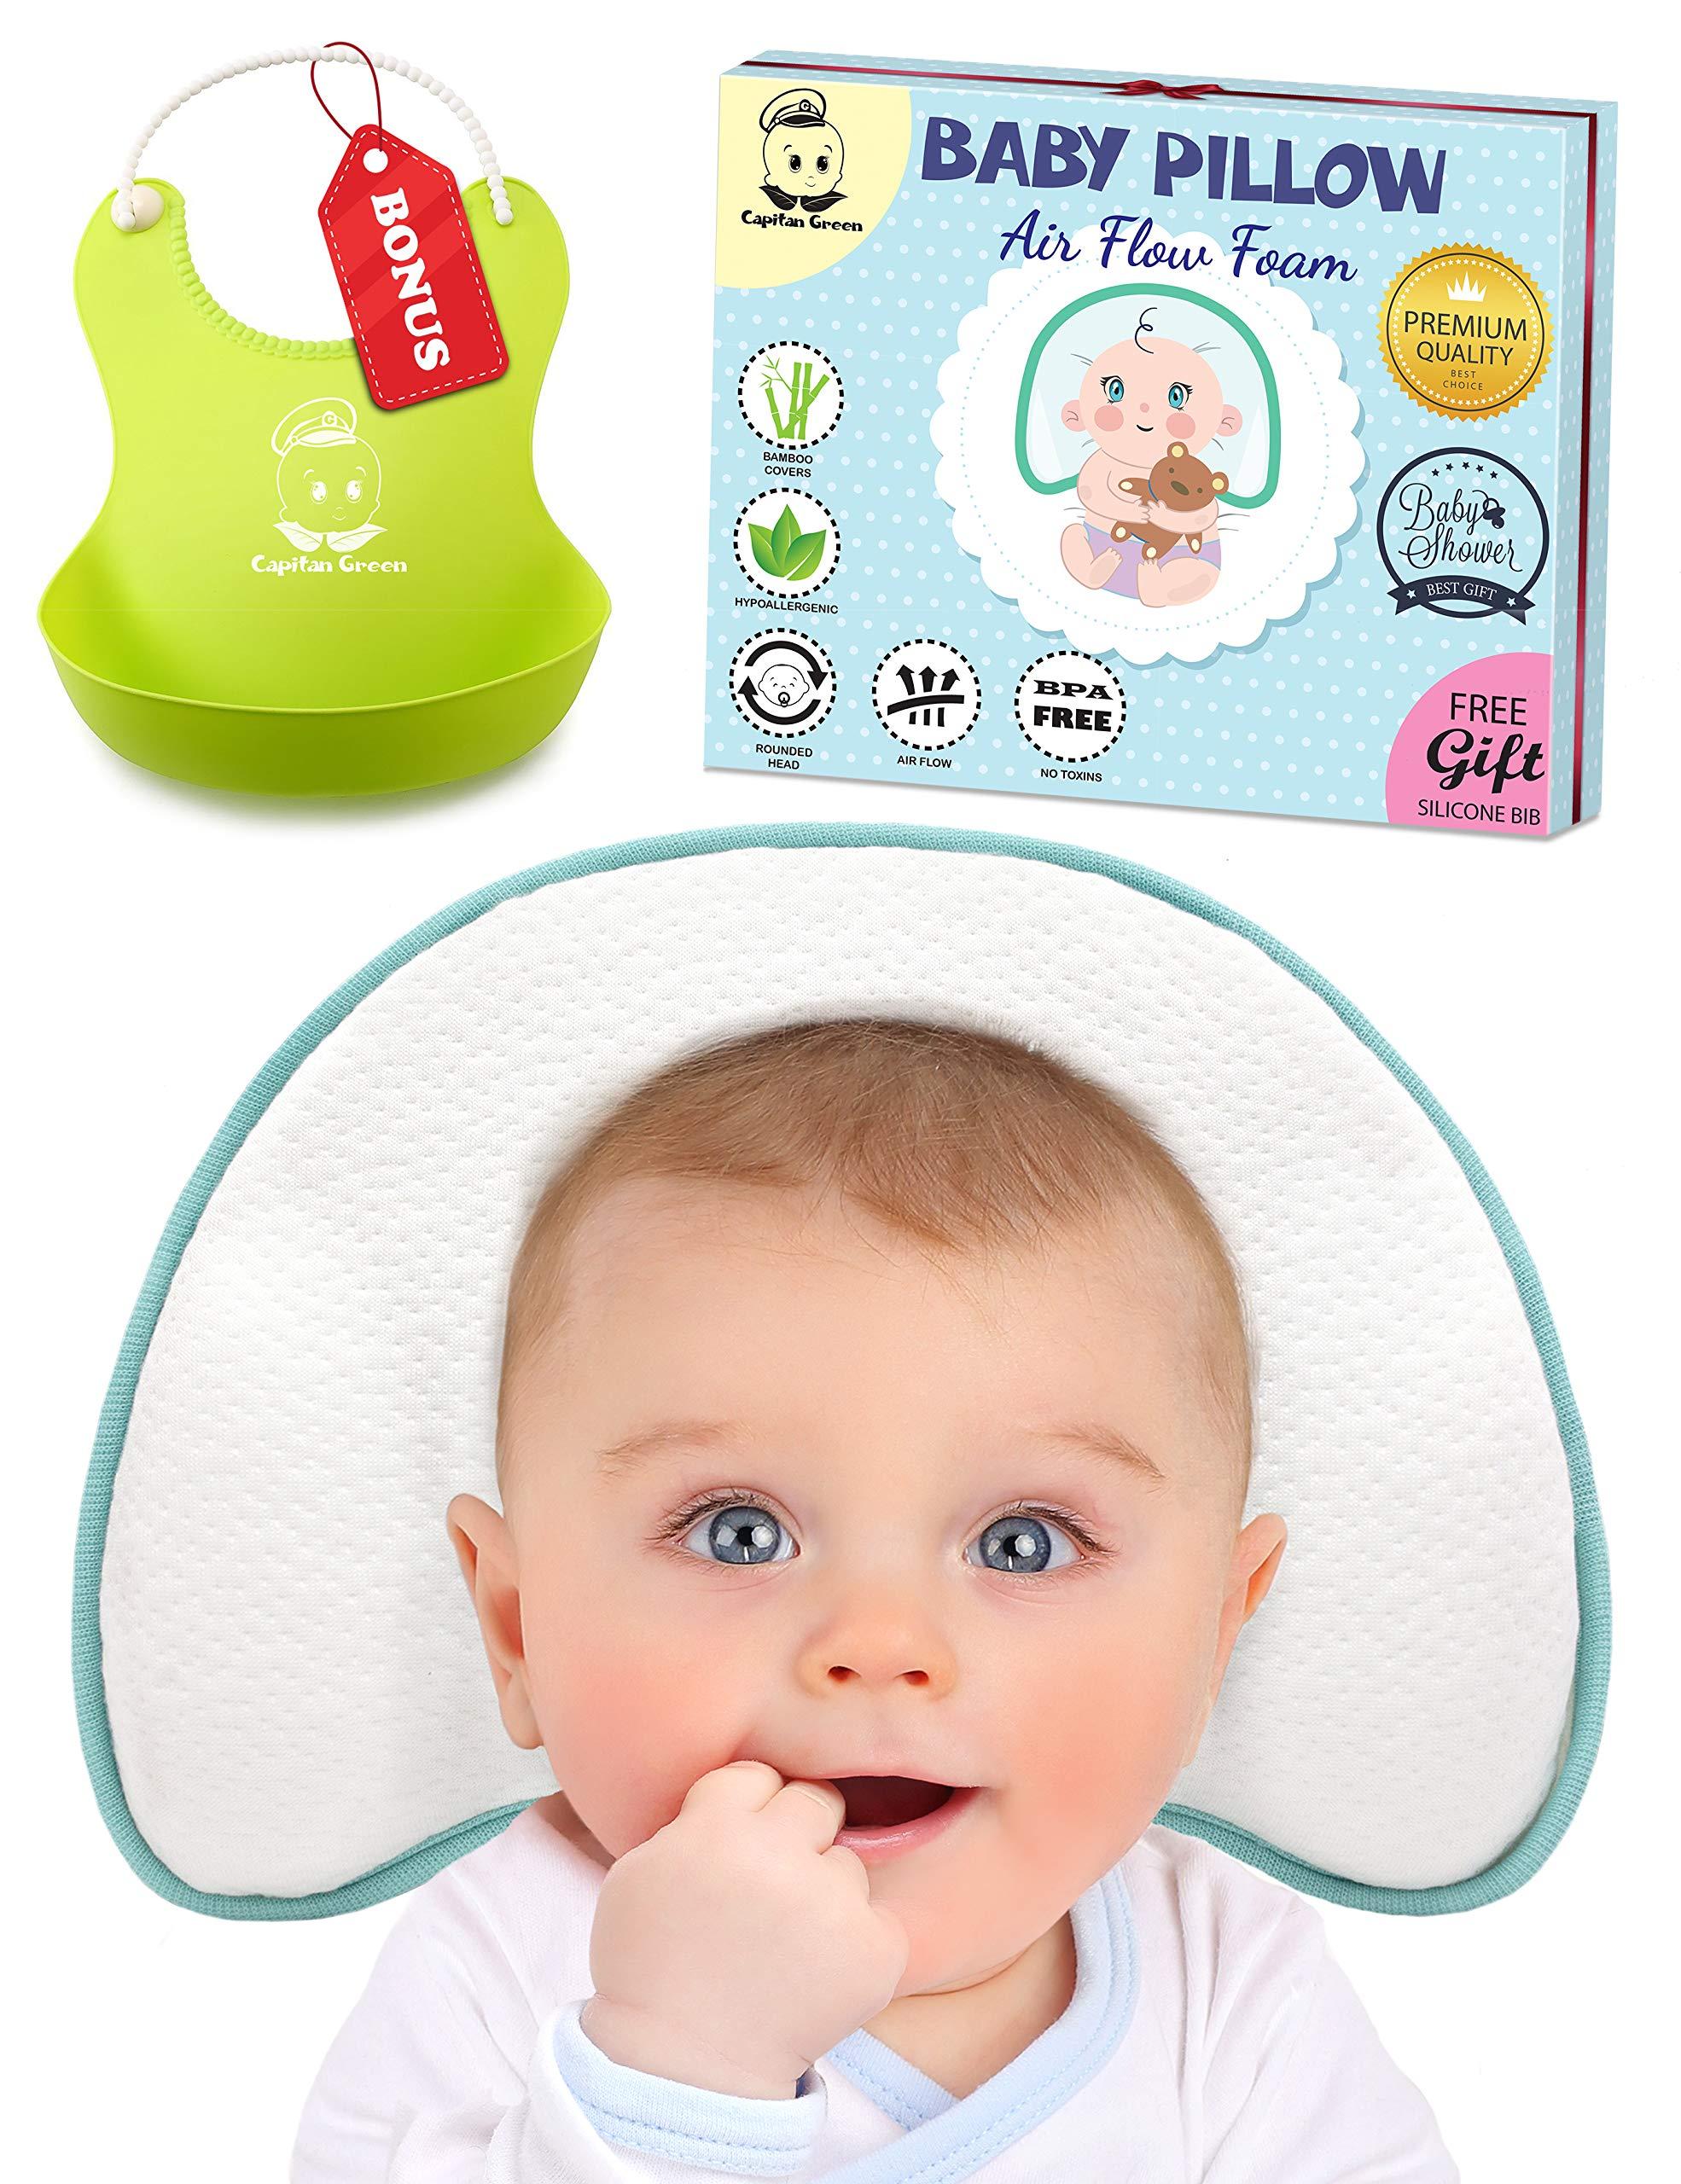 Infant Baby Flat Head Pillow | Sleeping Memory Foam Cushion for Newborn - Head Shaping & Correcting Flat Spot Syndrome | 2 Luxurious Bamboo Pillowcases & Bonus Bibs Included by Capitan Green by Capitan Green